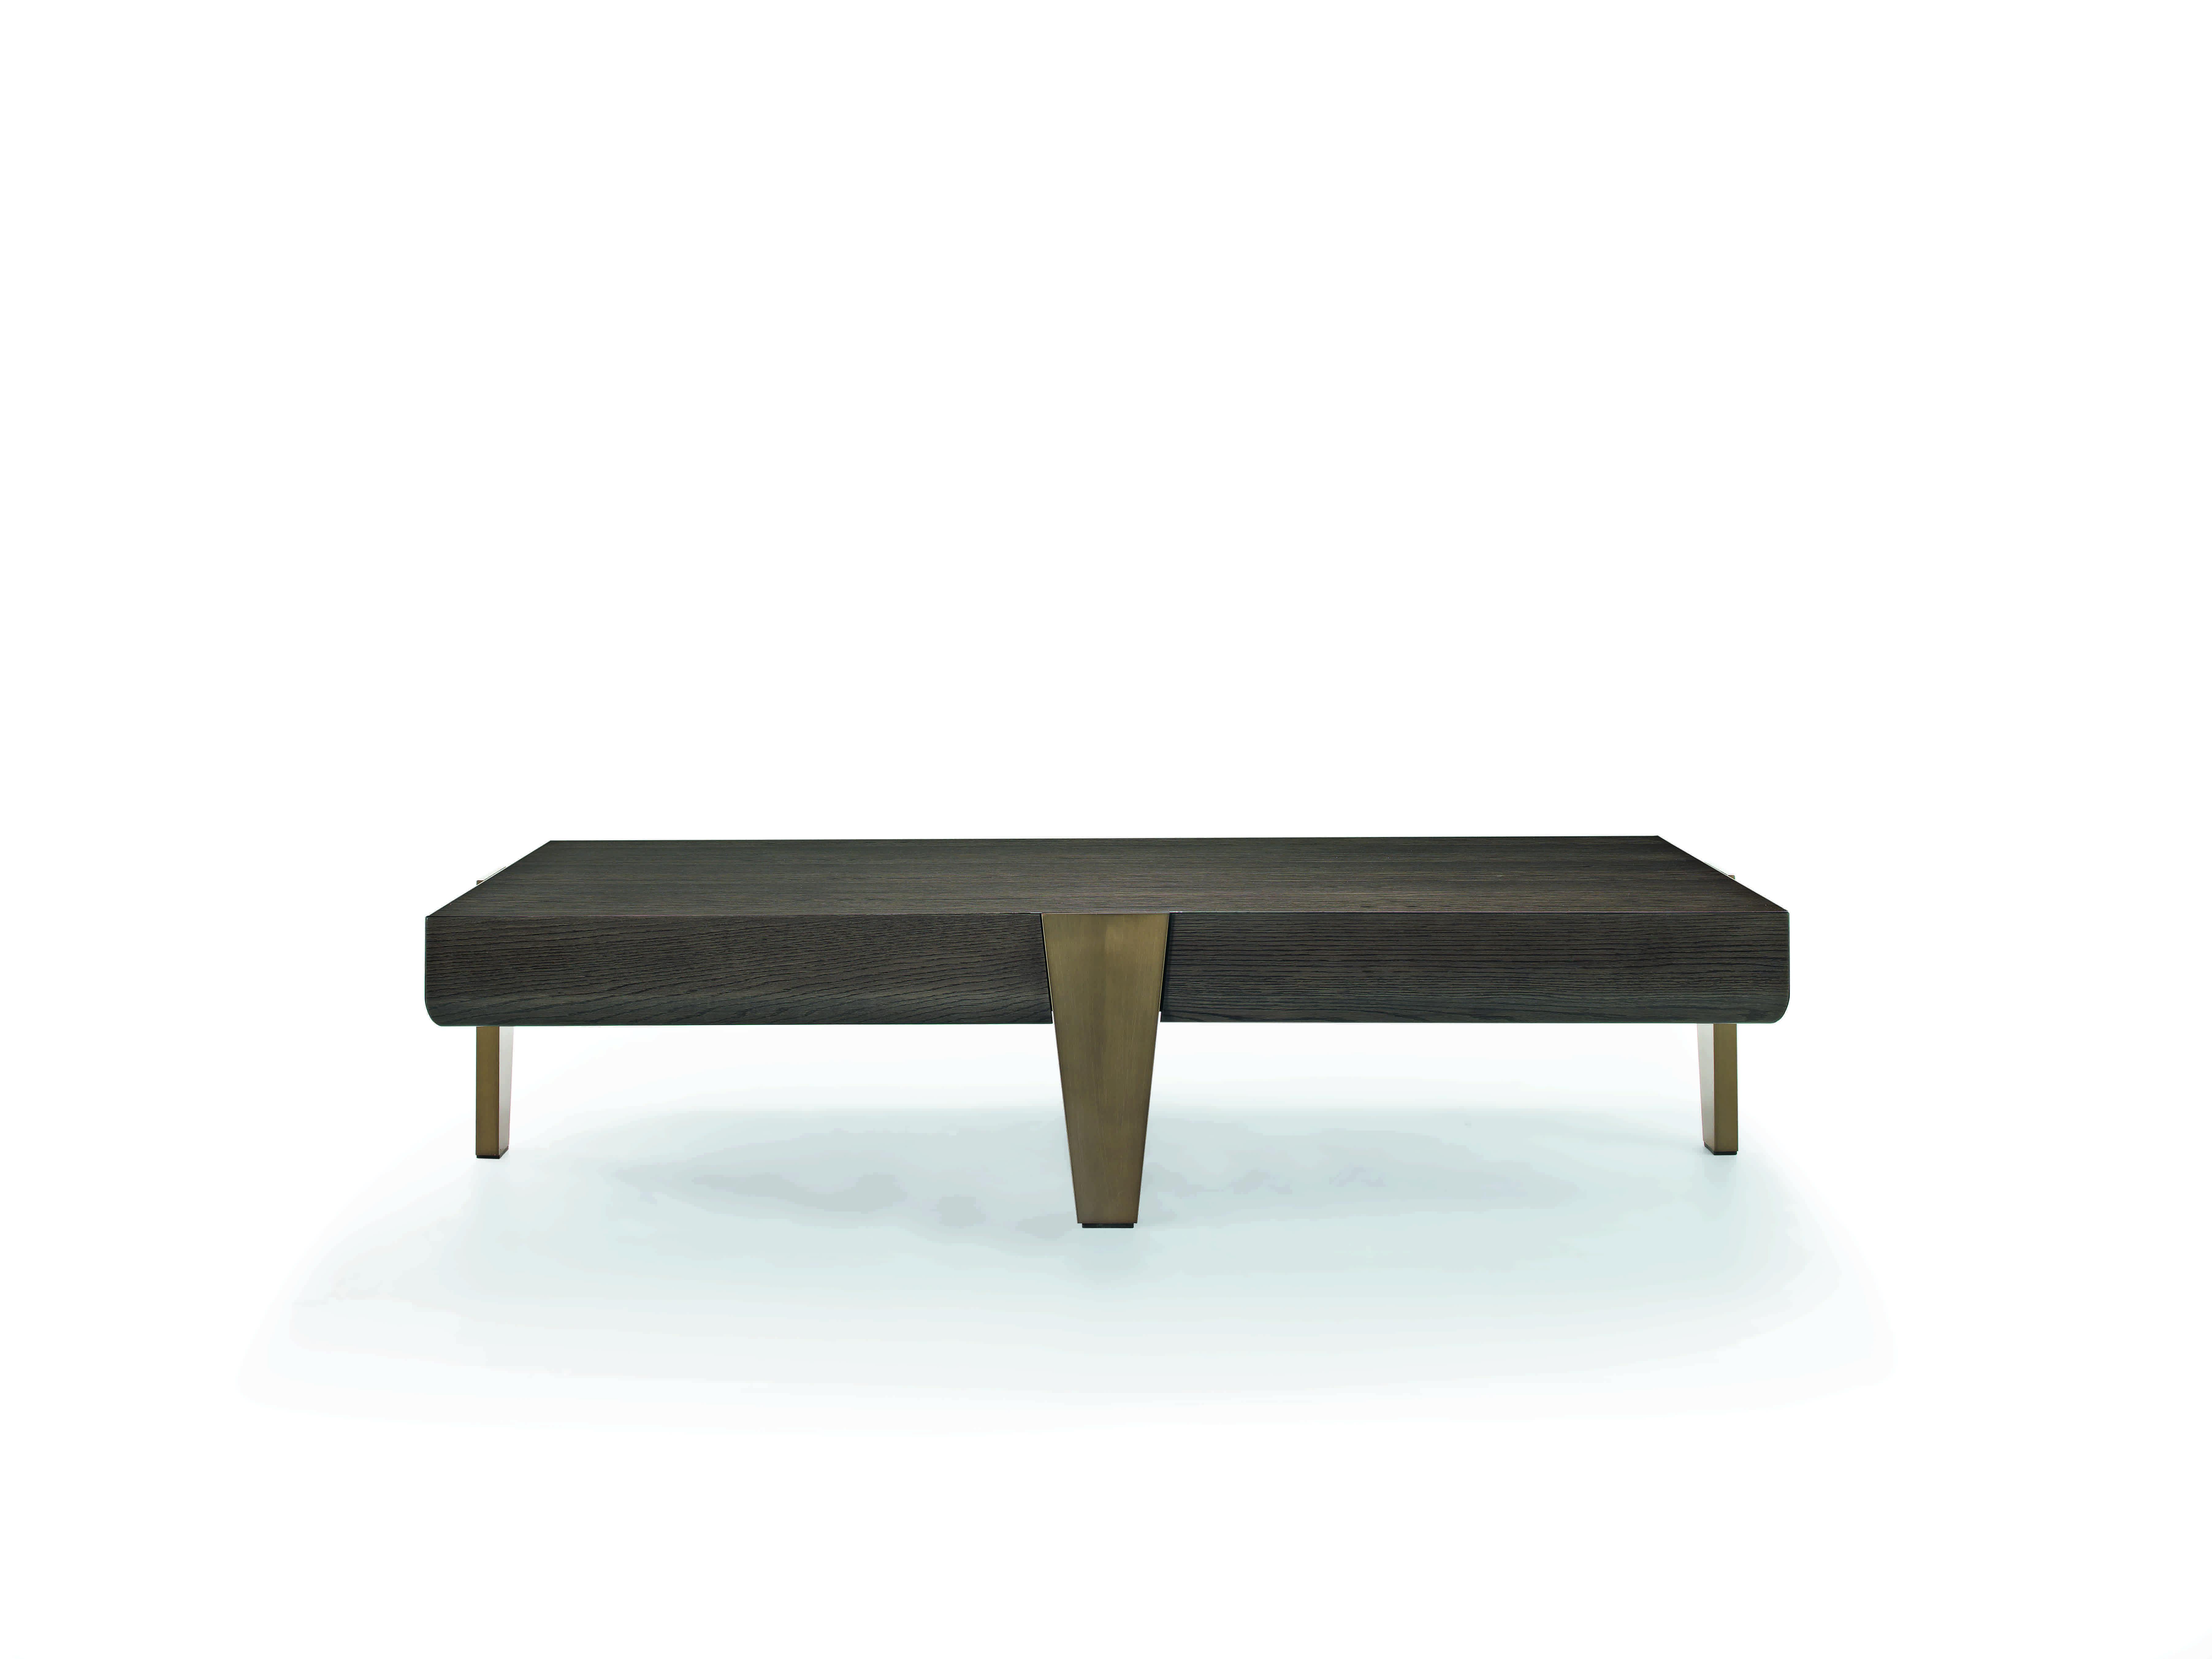 ehrf rchtige les chevalier de la table basse id es de. Black Bedroom Furniture Sets. Home Design Ideas